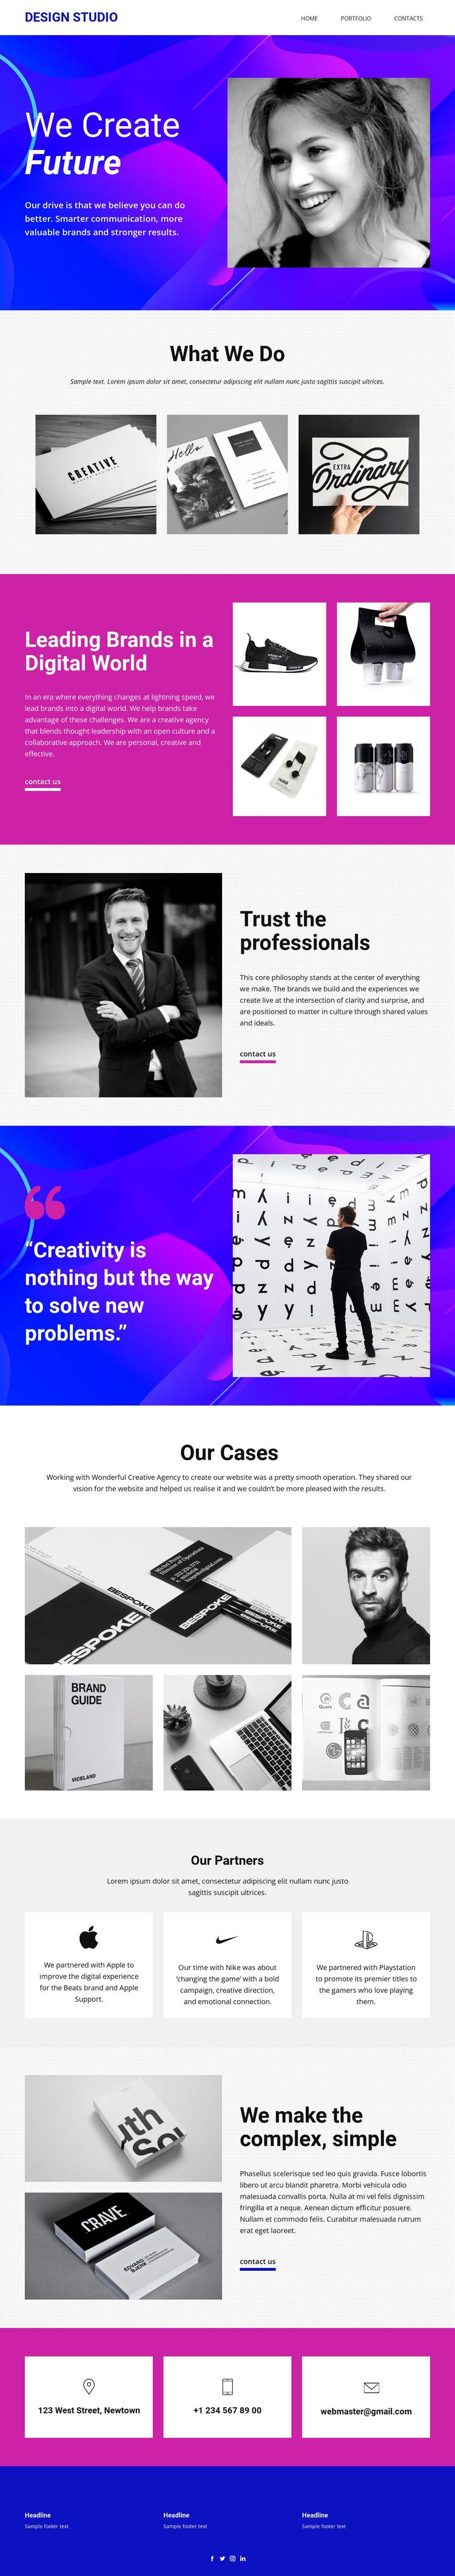 We develop the brand's core Joomla Template